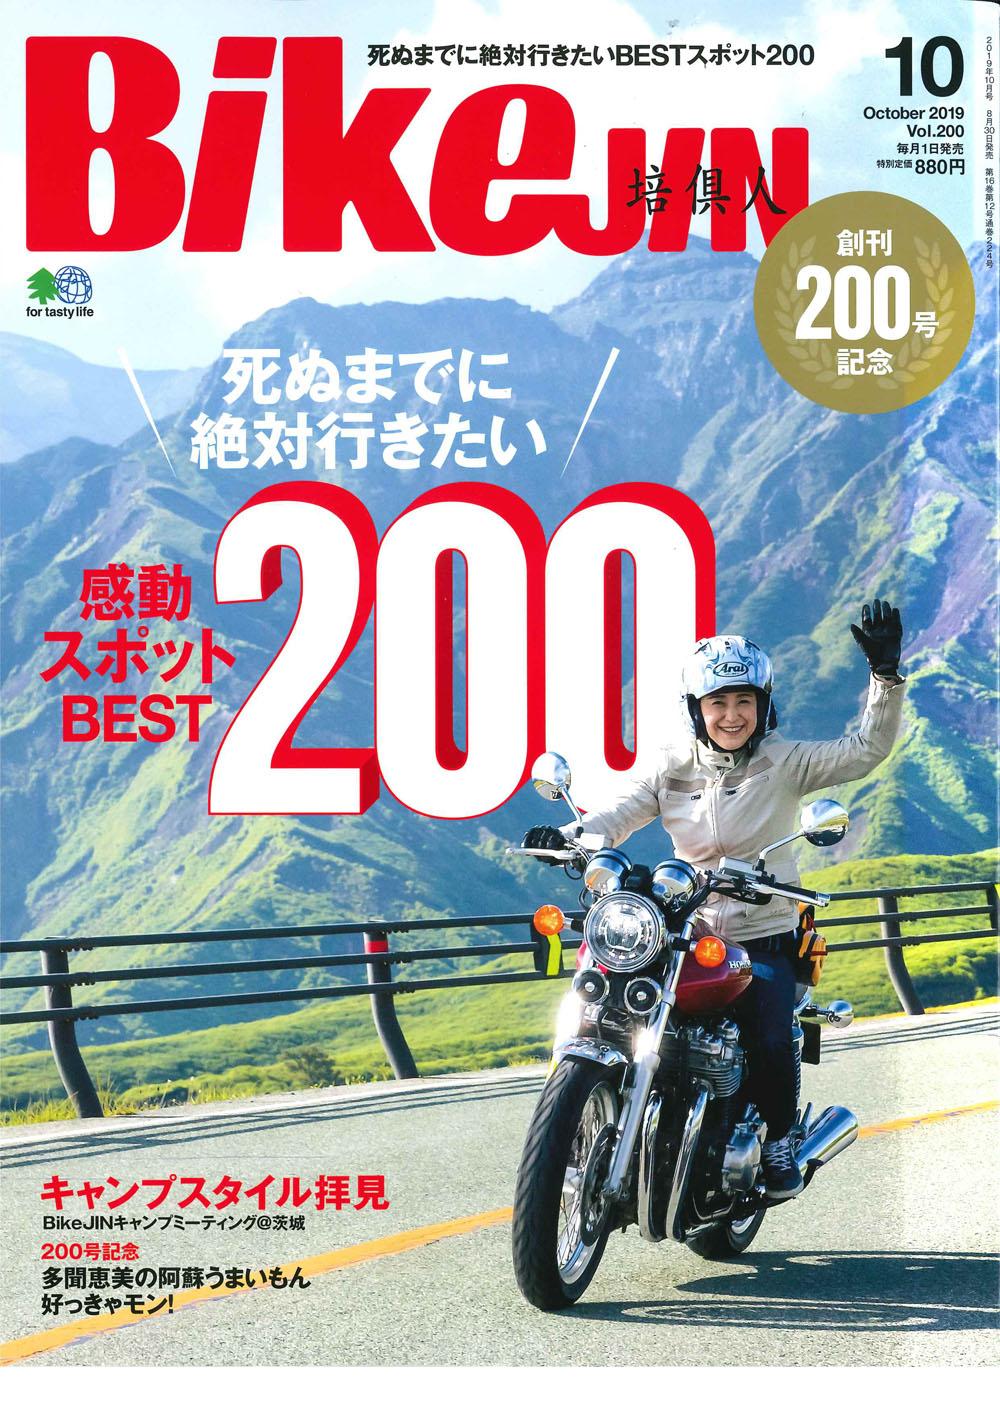 【BikeJIN 10月号掲載】 B+COMユニバーサル機能